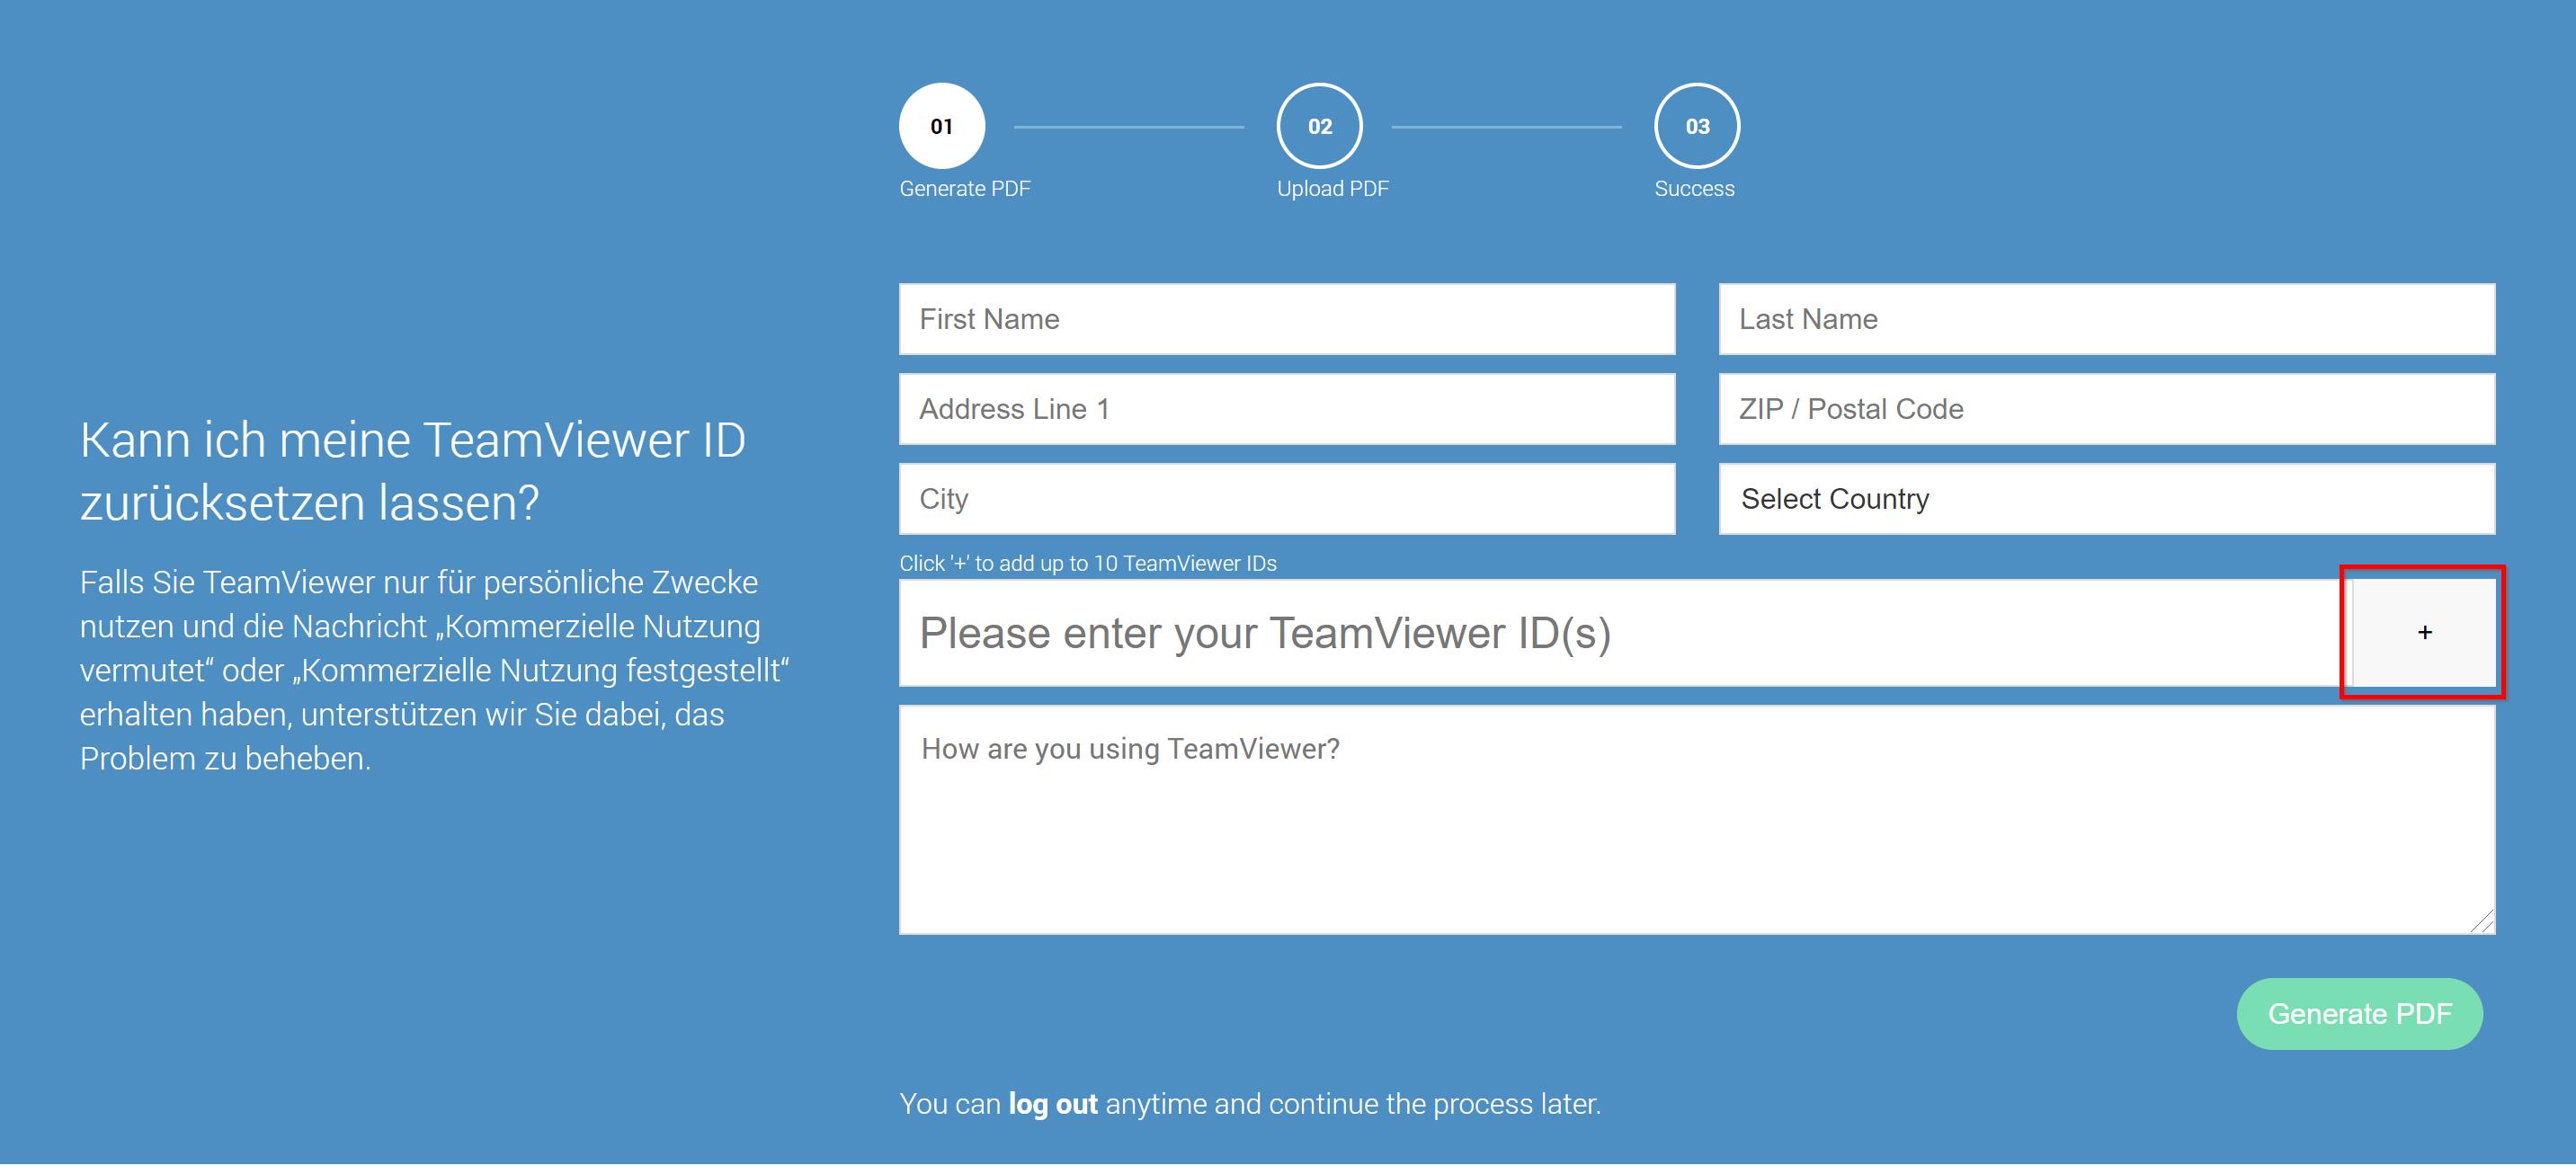 2021-05-28 15_04_56-Reset-Management - TeamViewer.png